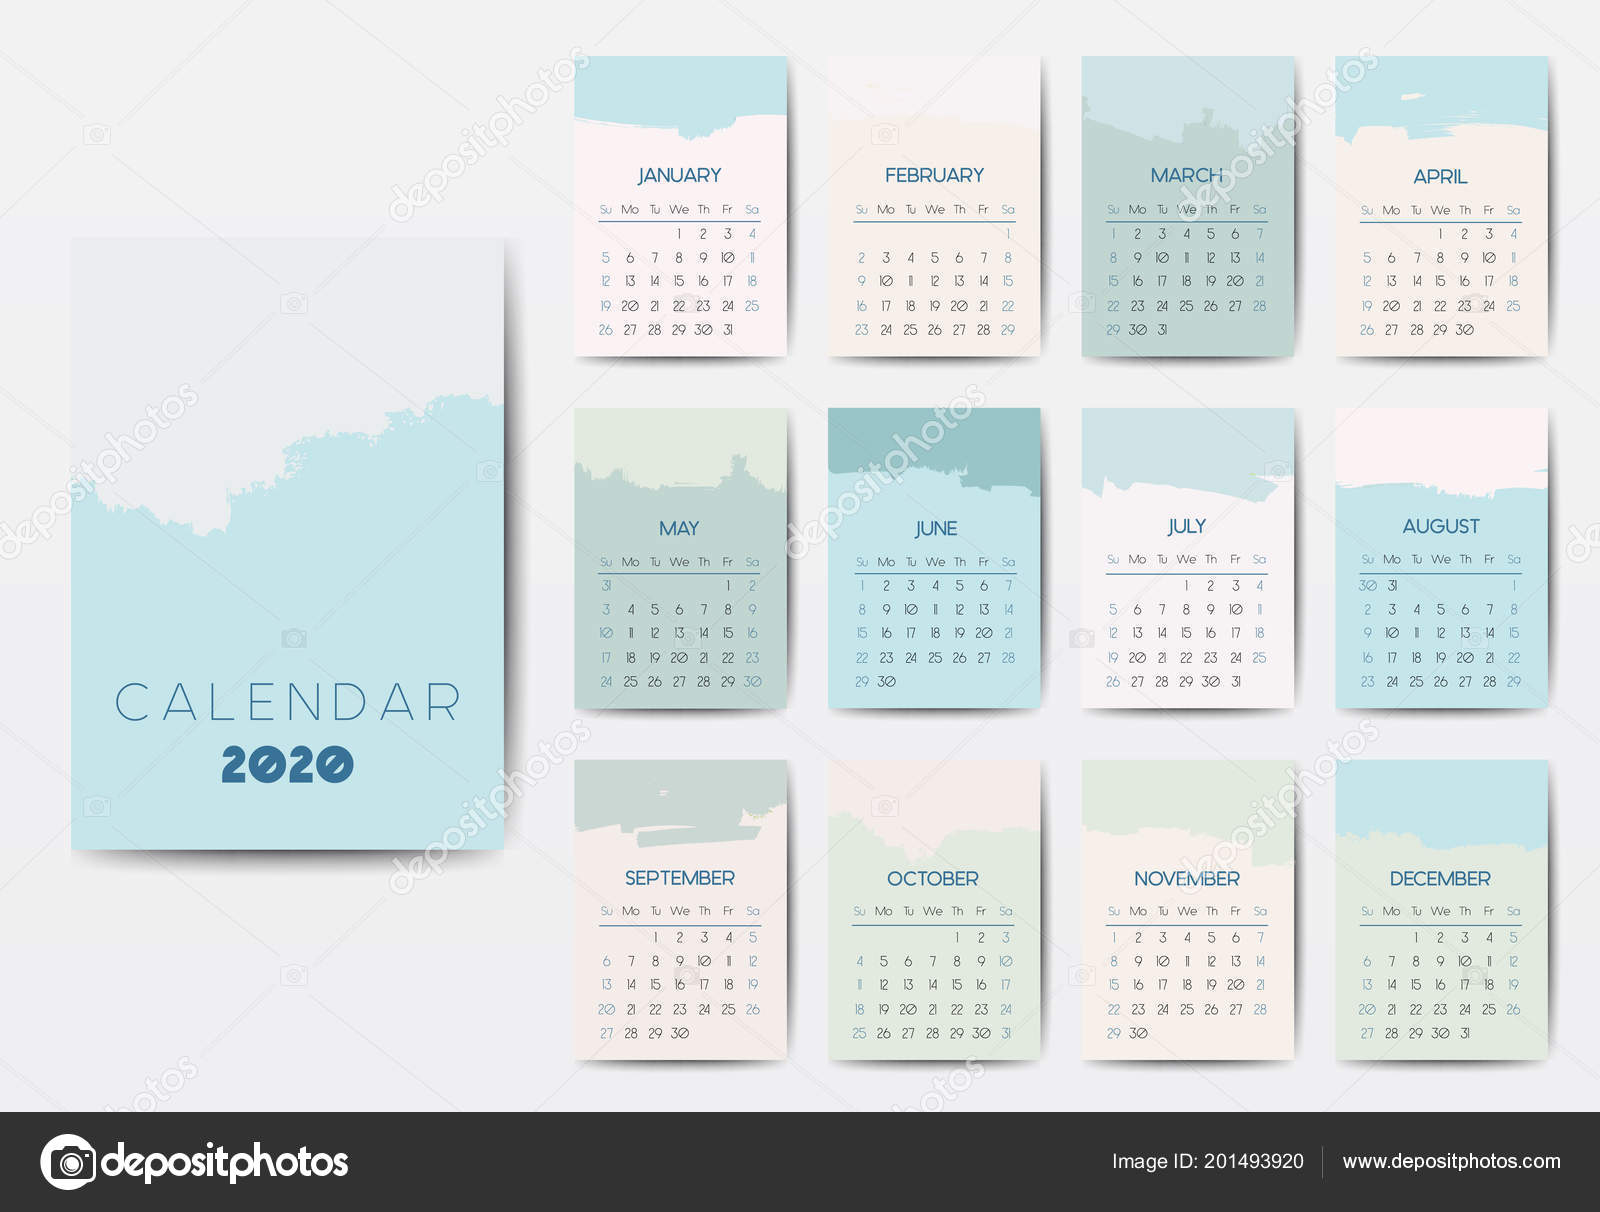 Modele De Calendrier 2020.Le Modele De Calendrier 2020 Image Vectorielle Mooo